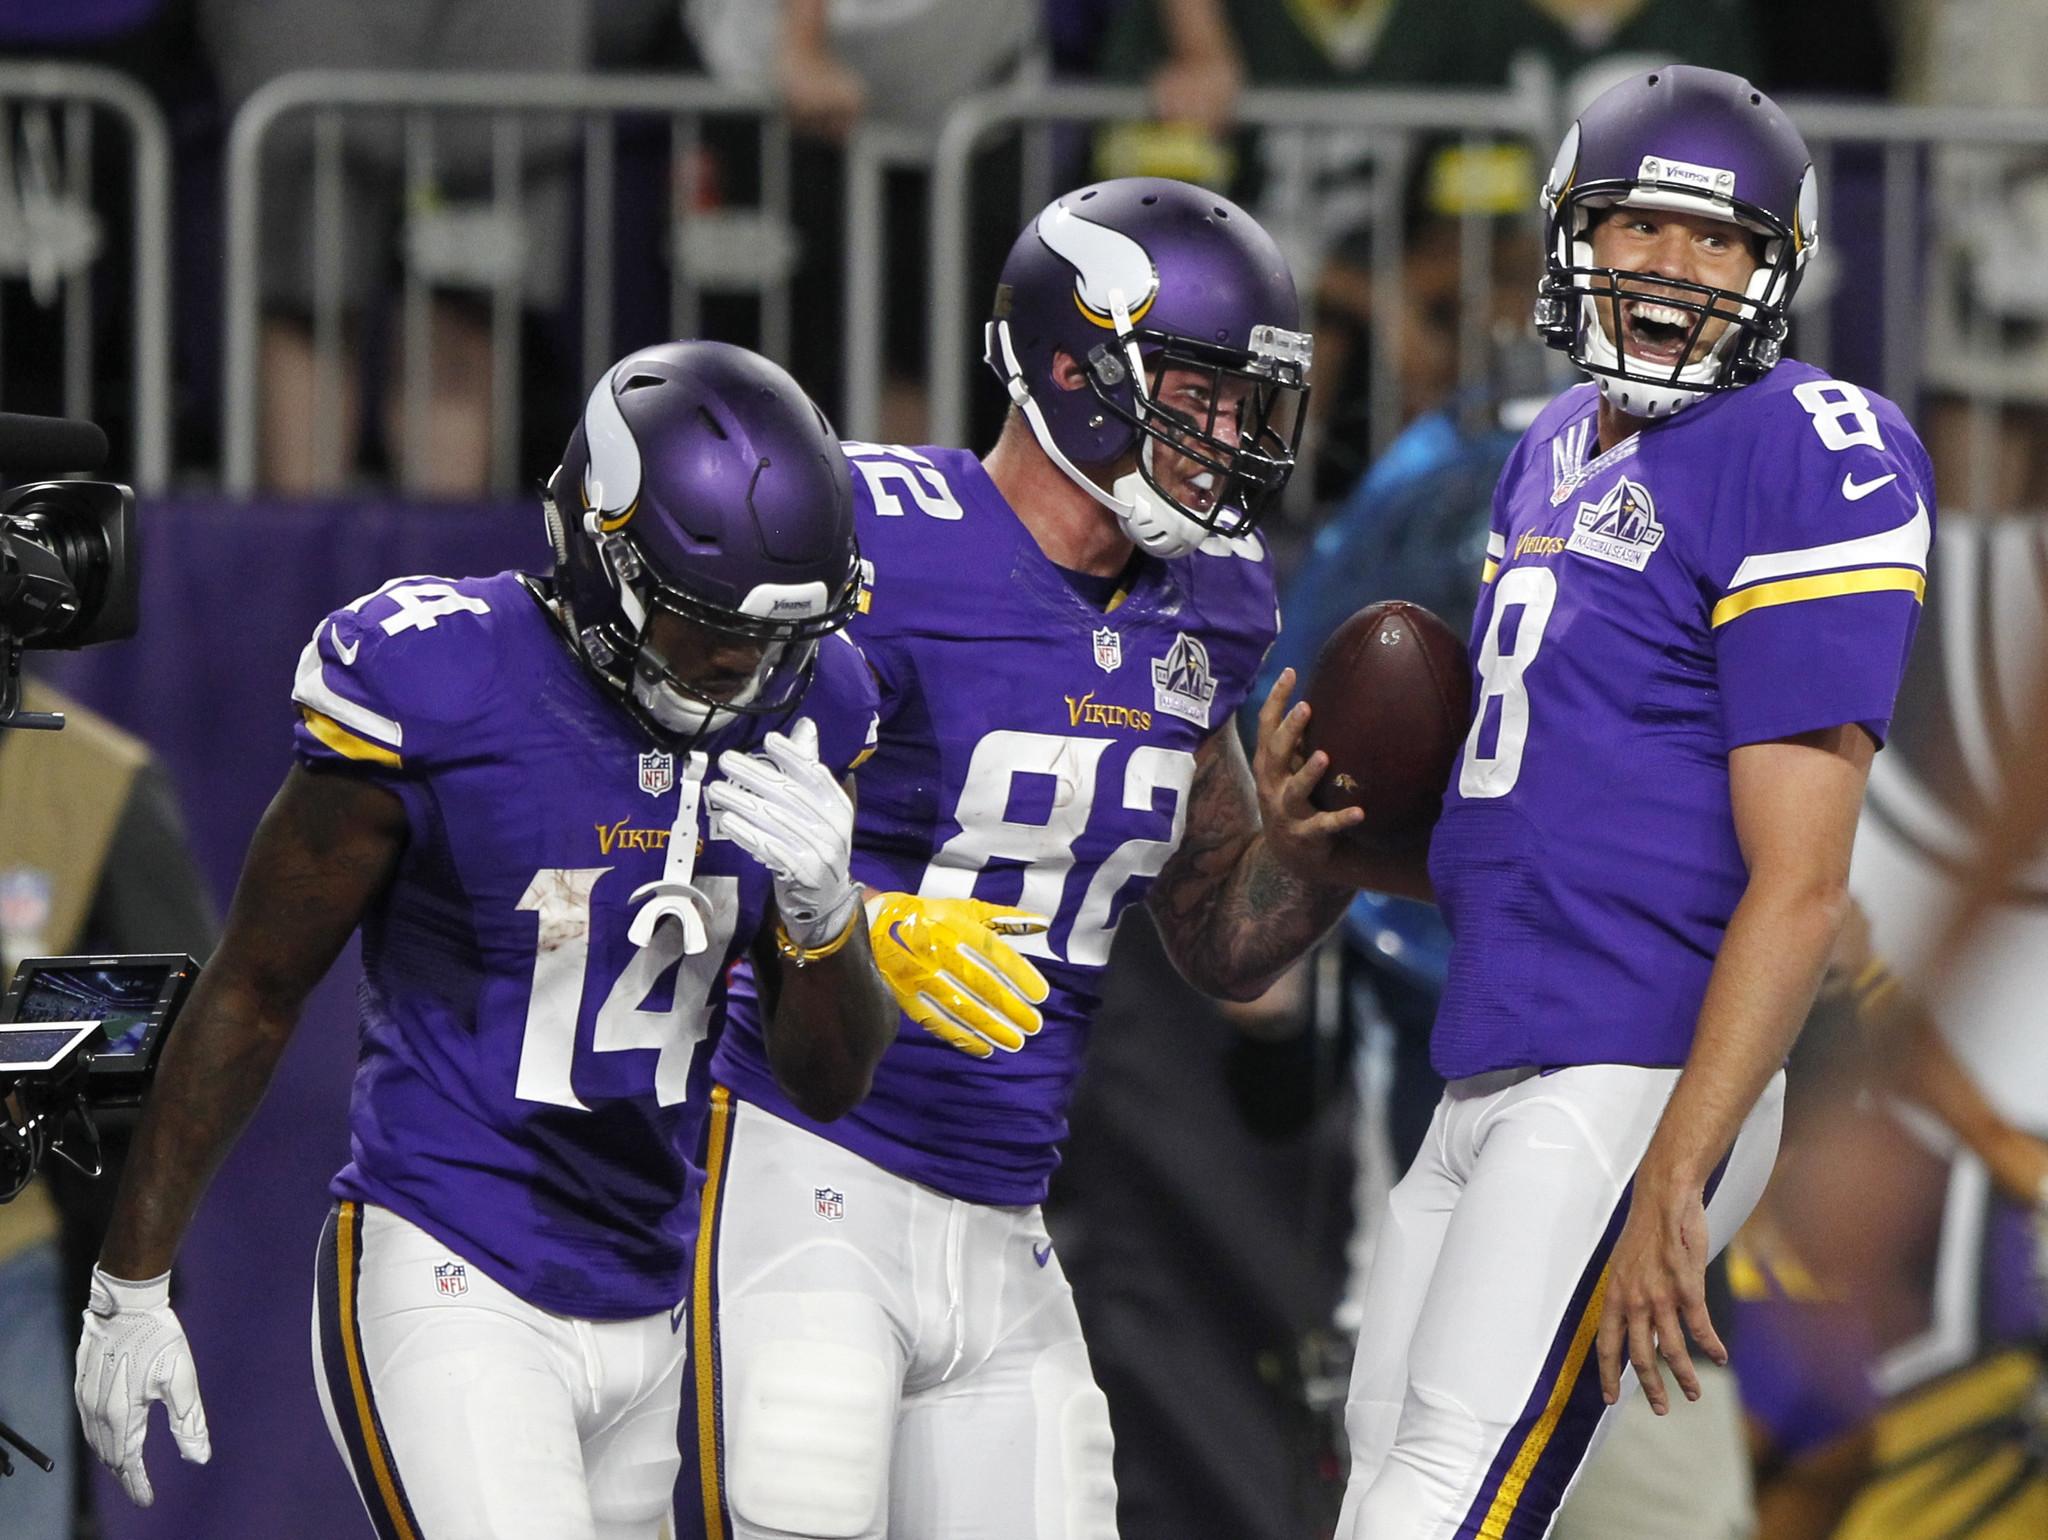 Sam Bradford leads Vikings over Packers 17-14 in Minnesota debut - Chicago  Tribune 9b1ab0ac5